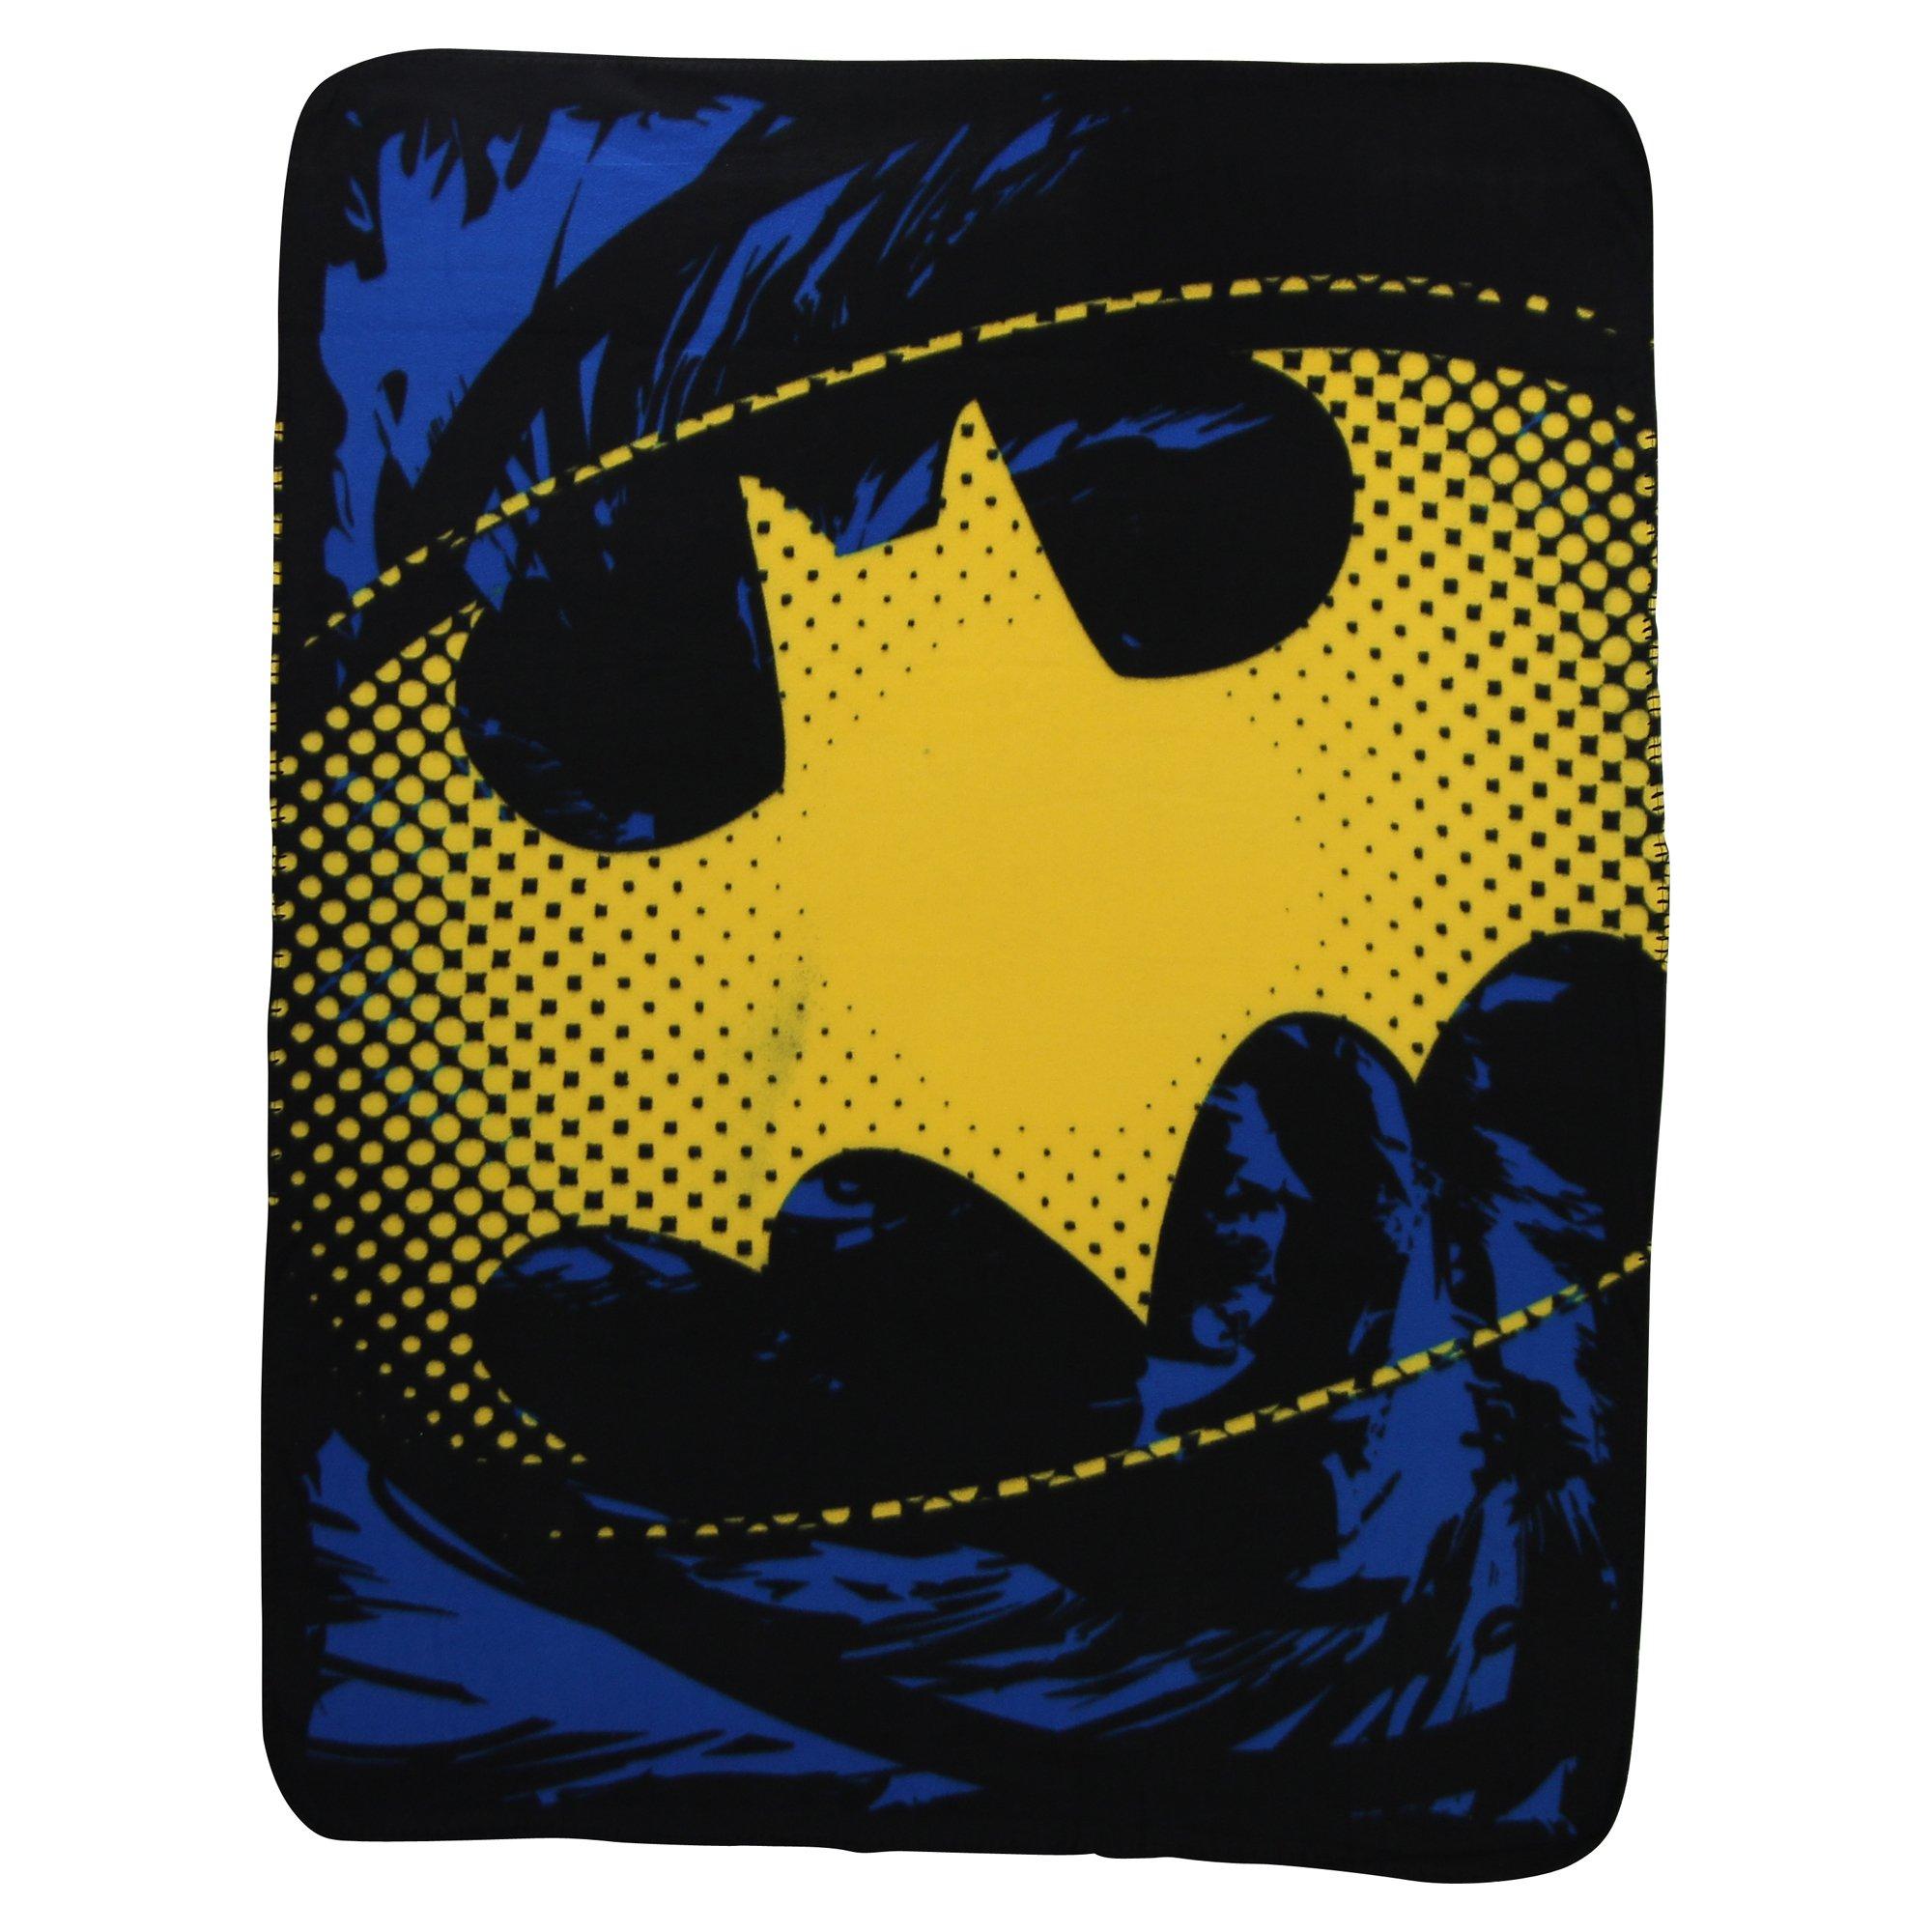 The Northwest Company Batman Ripped Shield Fleece Blanket, 45 x 60-inches